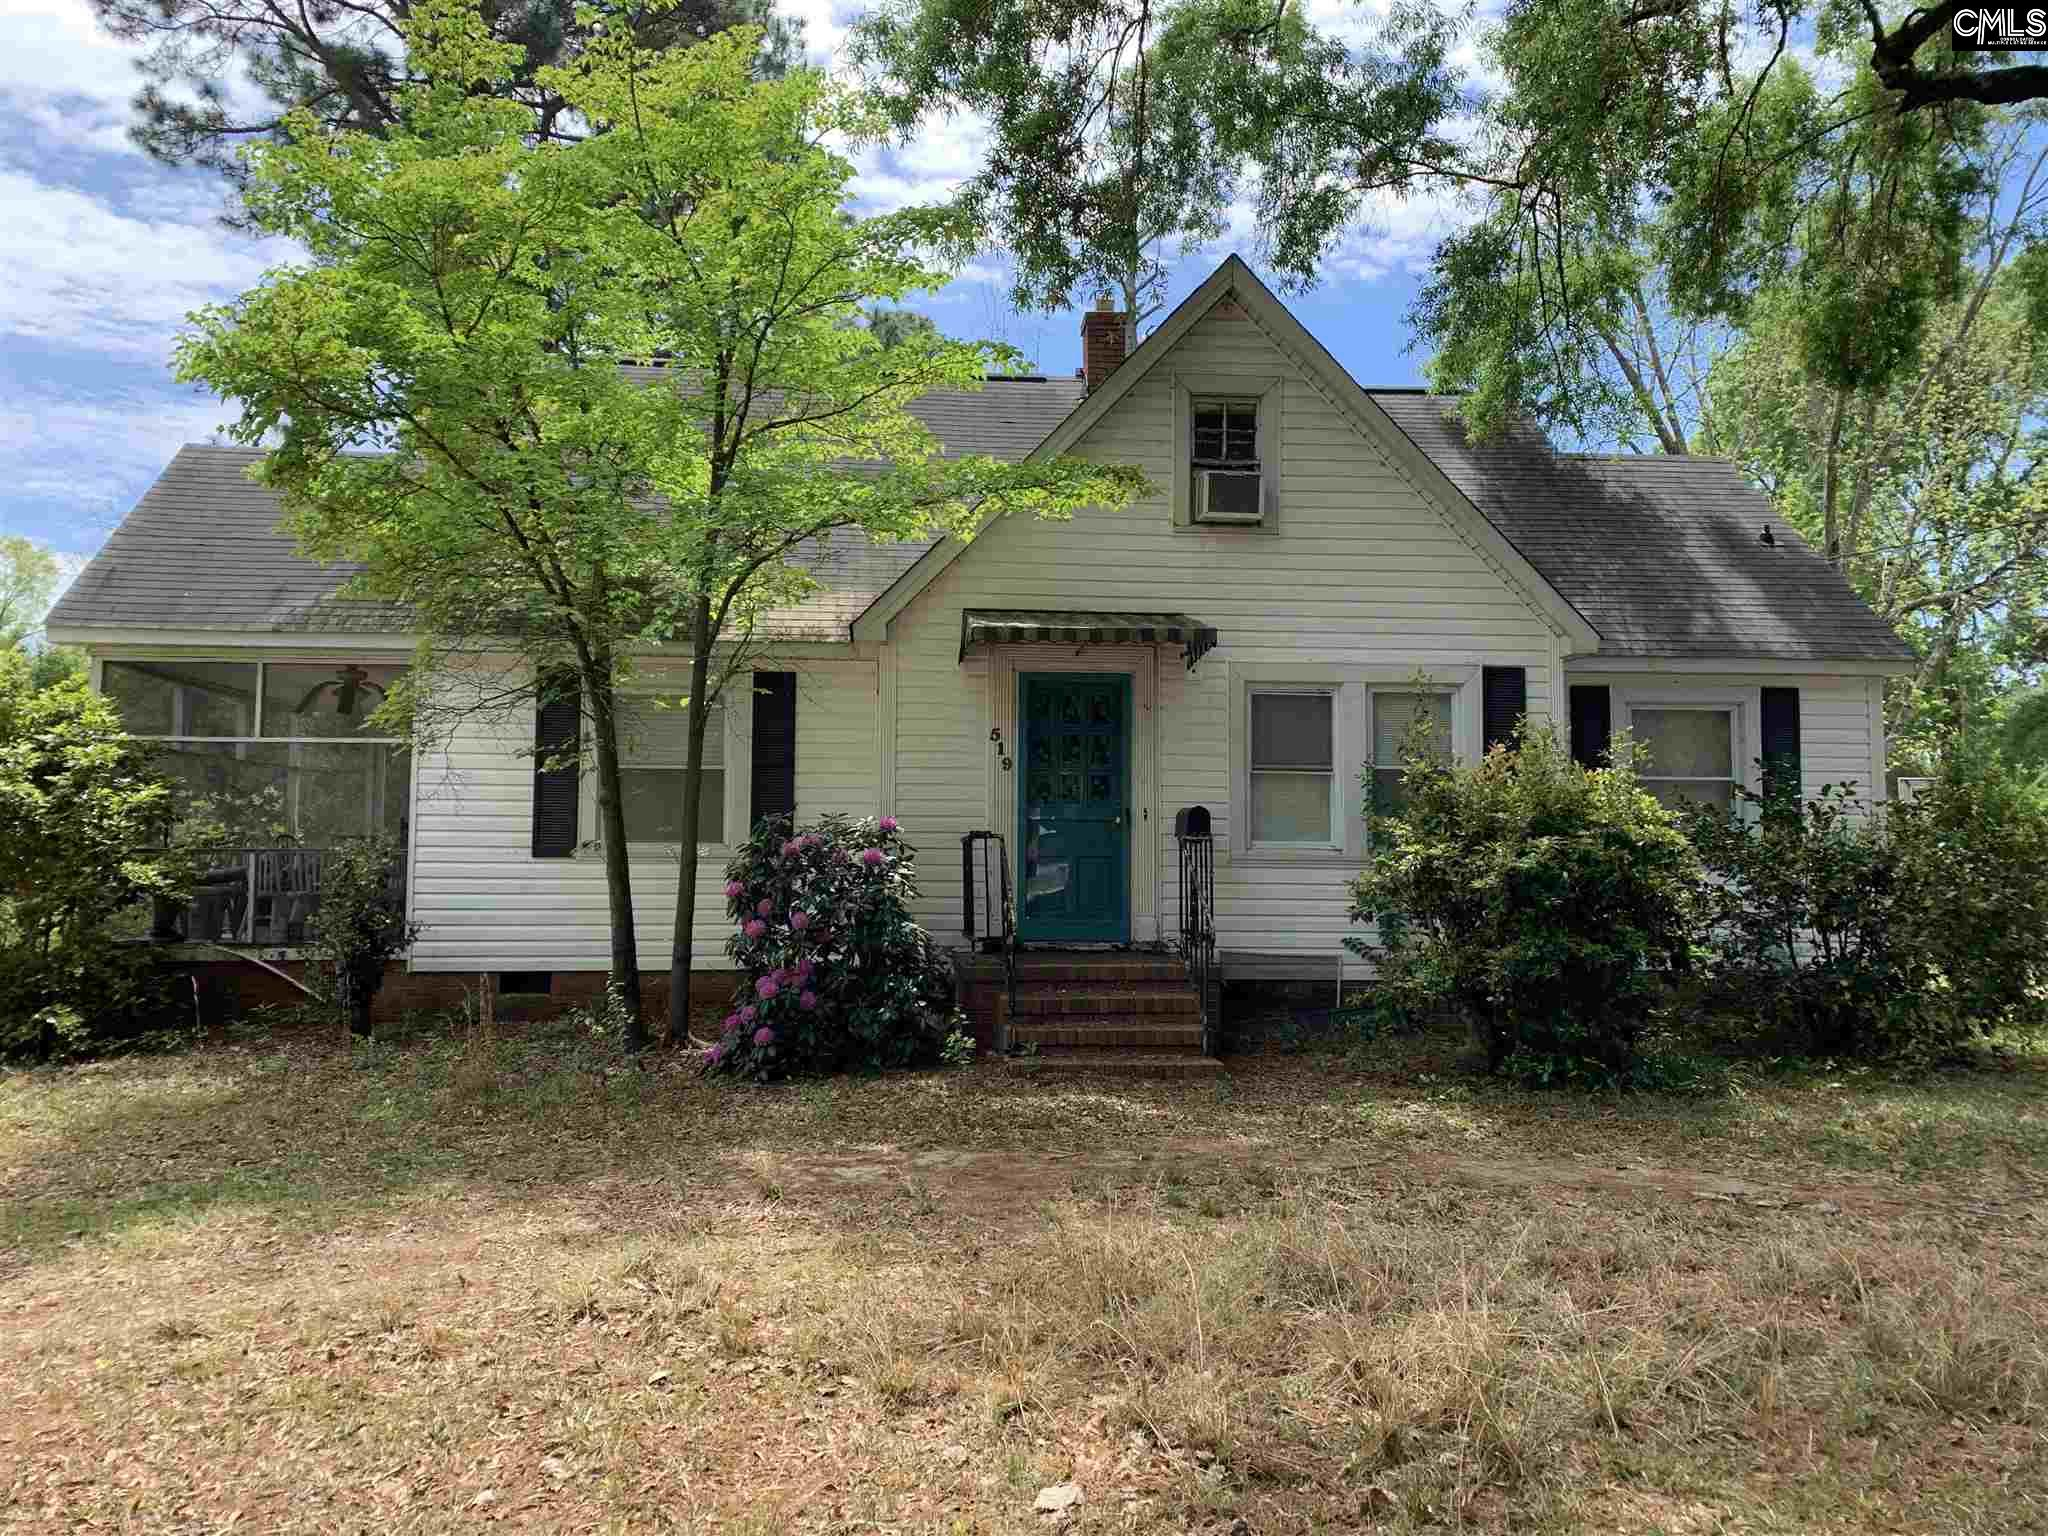 519 W Carolina Avenue Hartsville, SC 29550